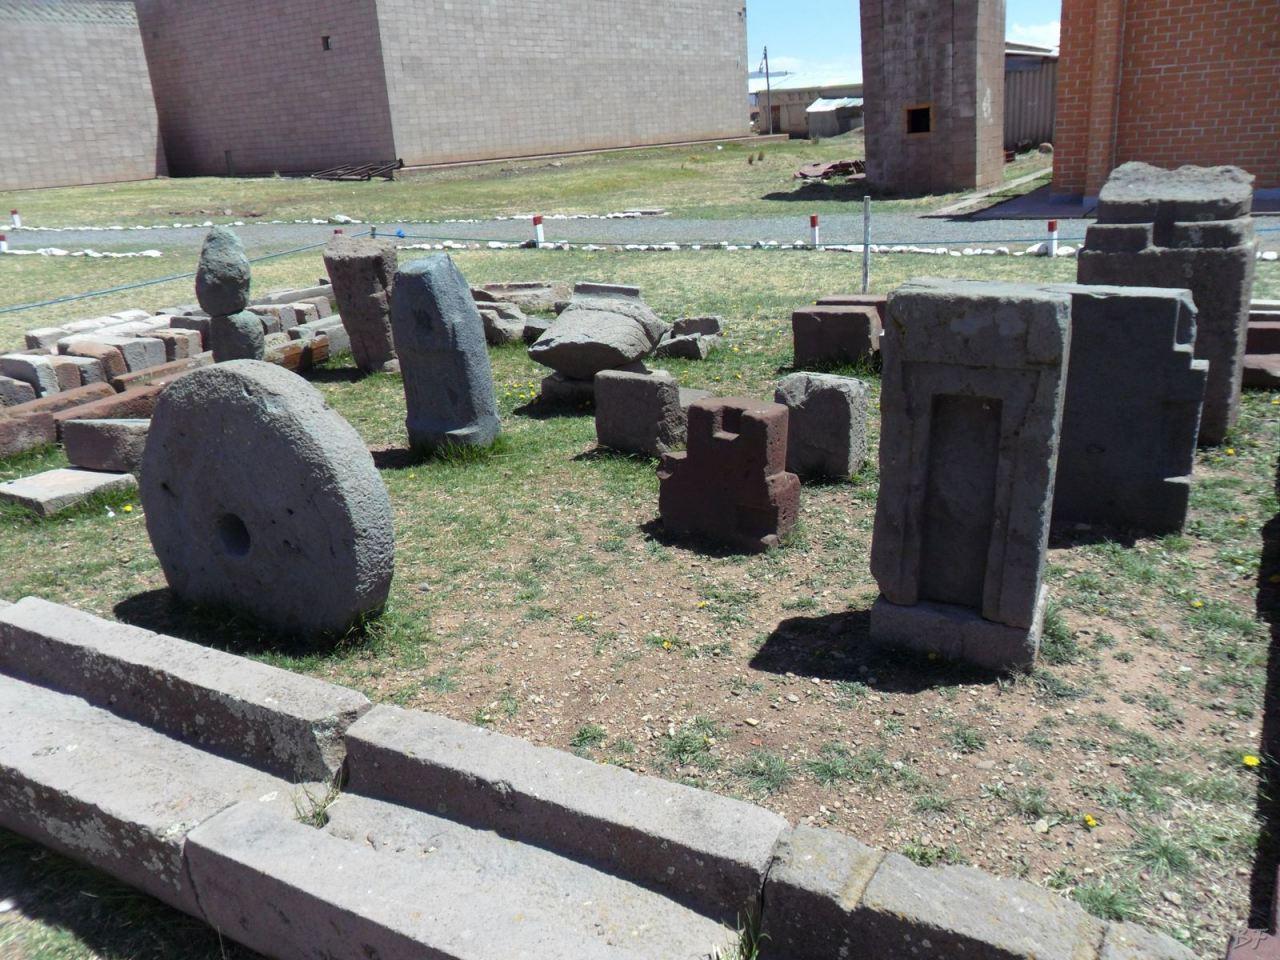 Sito-Megalitico-Piramide-Akapana-Kalasasaya-Menhir-Tiahuanaco-Bolivia-8